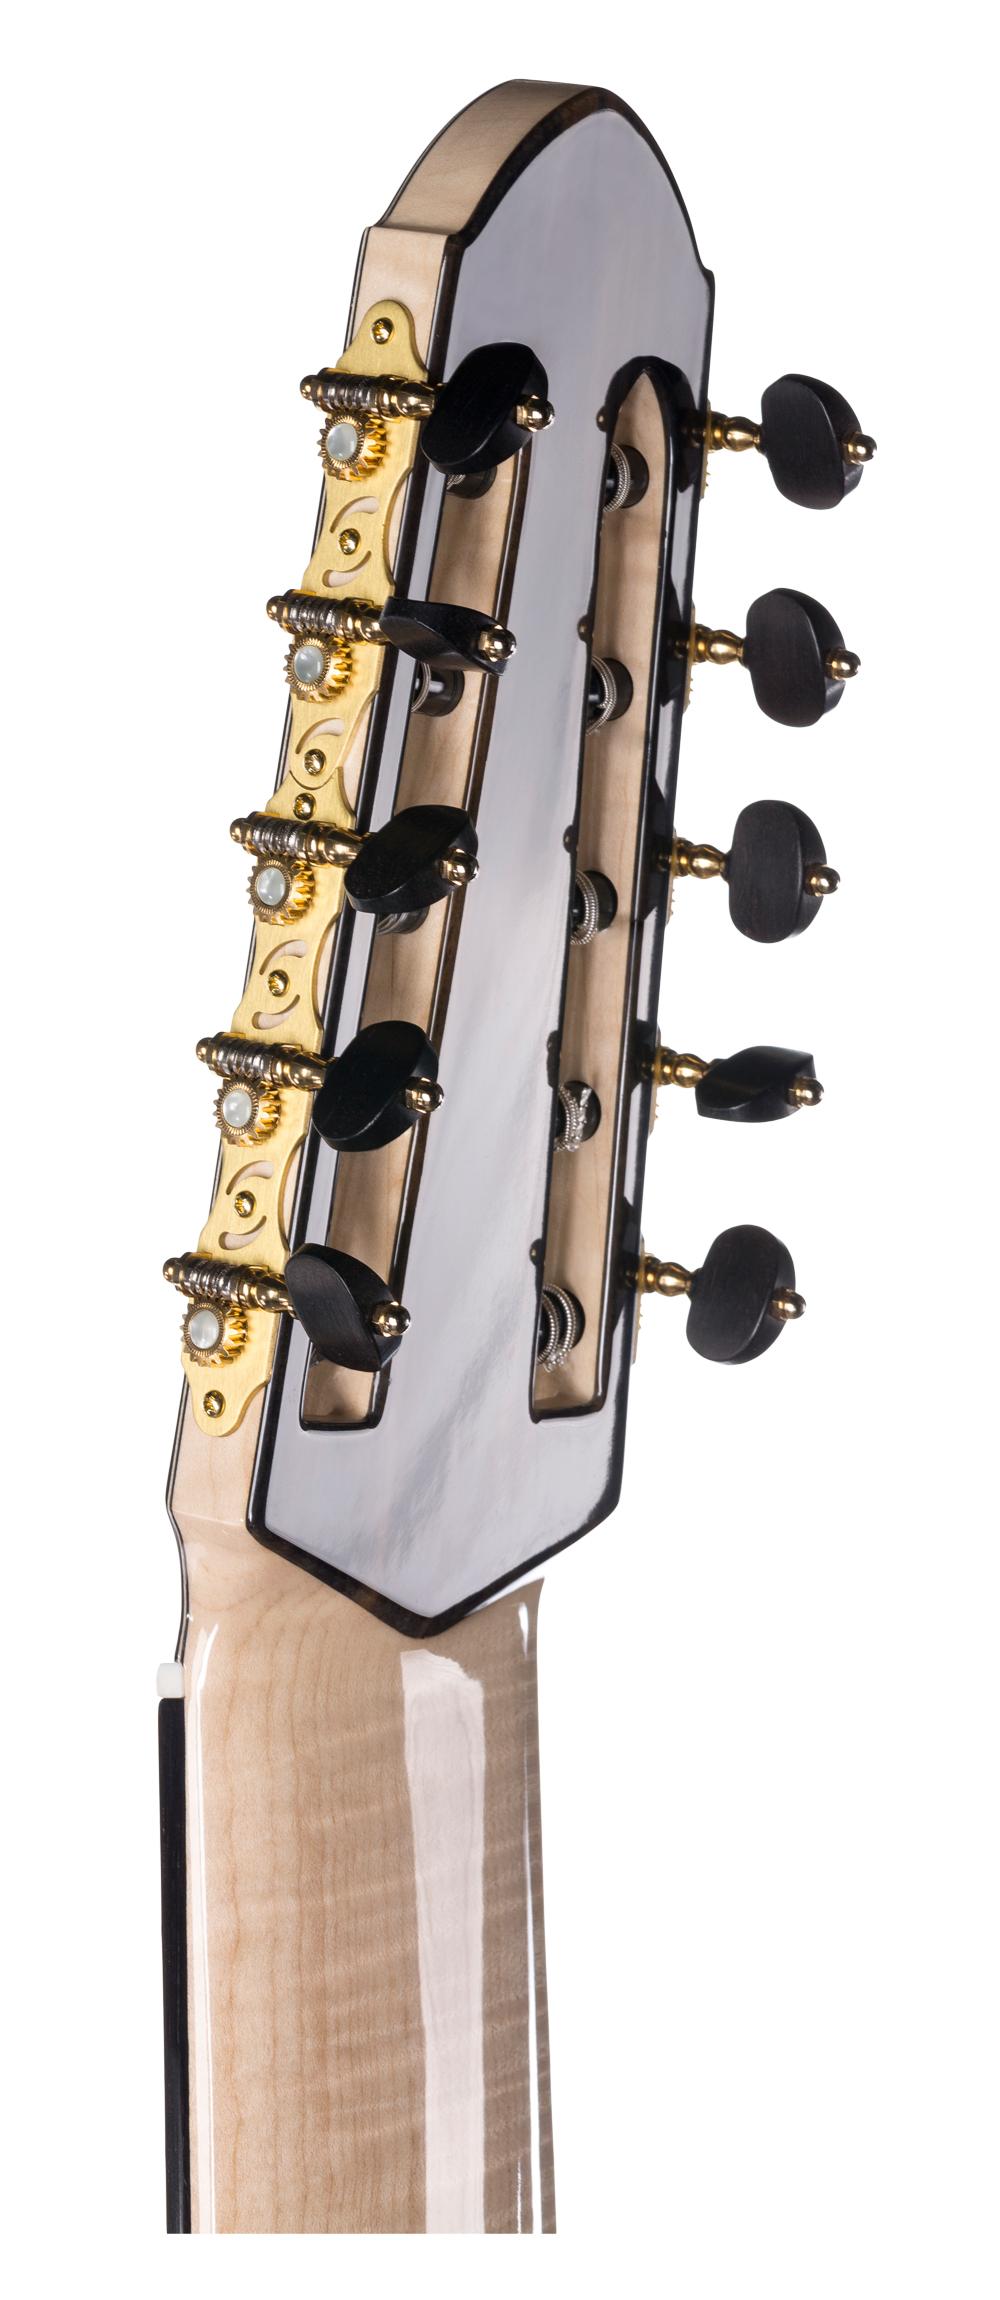 ten-string-classical-guitar-head